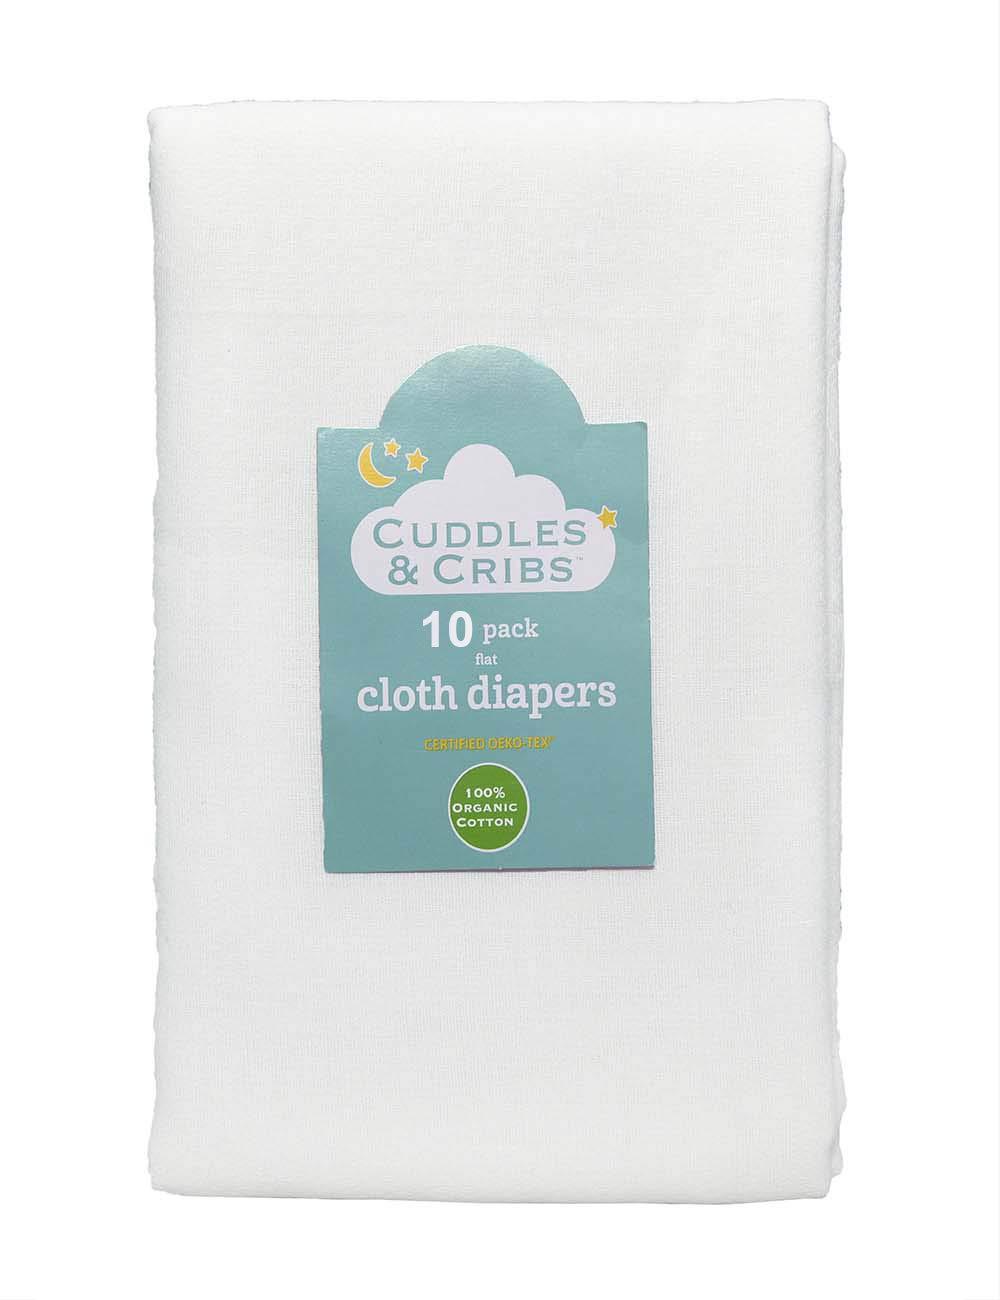 Cuddles & Cribs Cotton Cloth Diapers/Burp Cloth - 10 Count, Flat (24 x 27 Inch) by Cuddles & Cribs